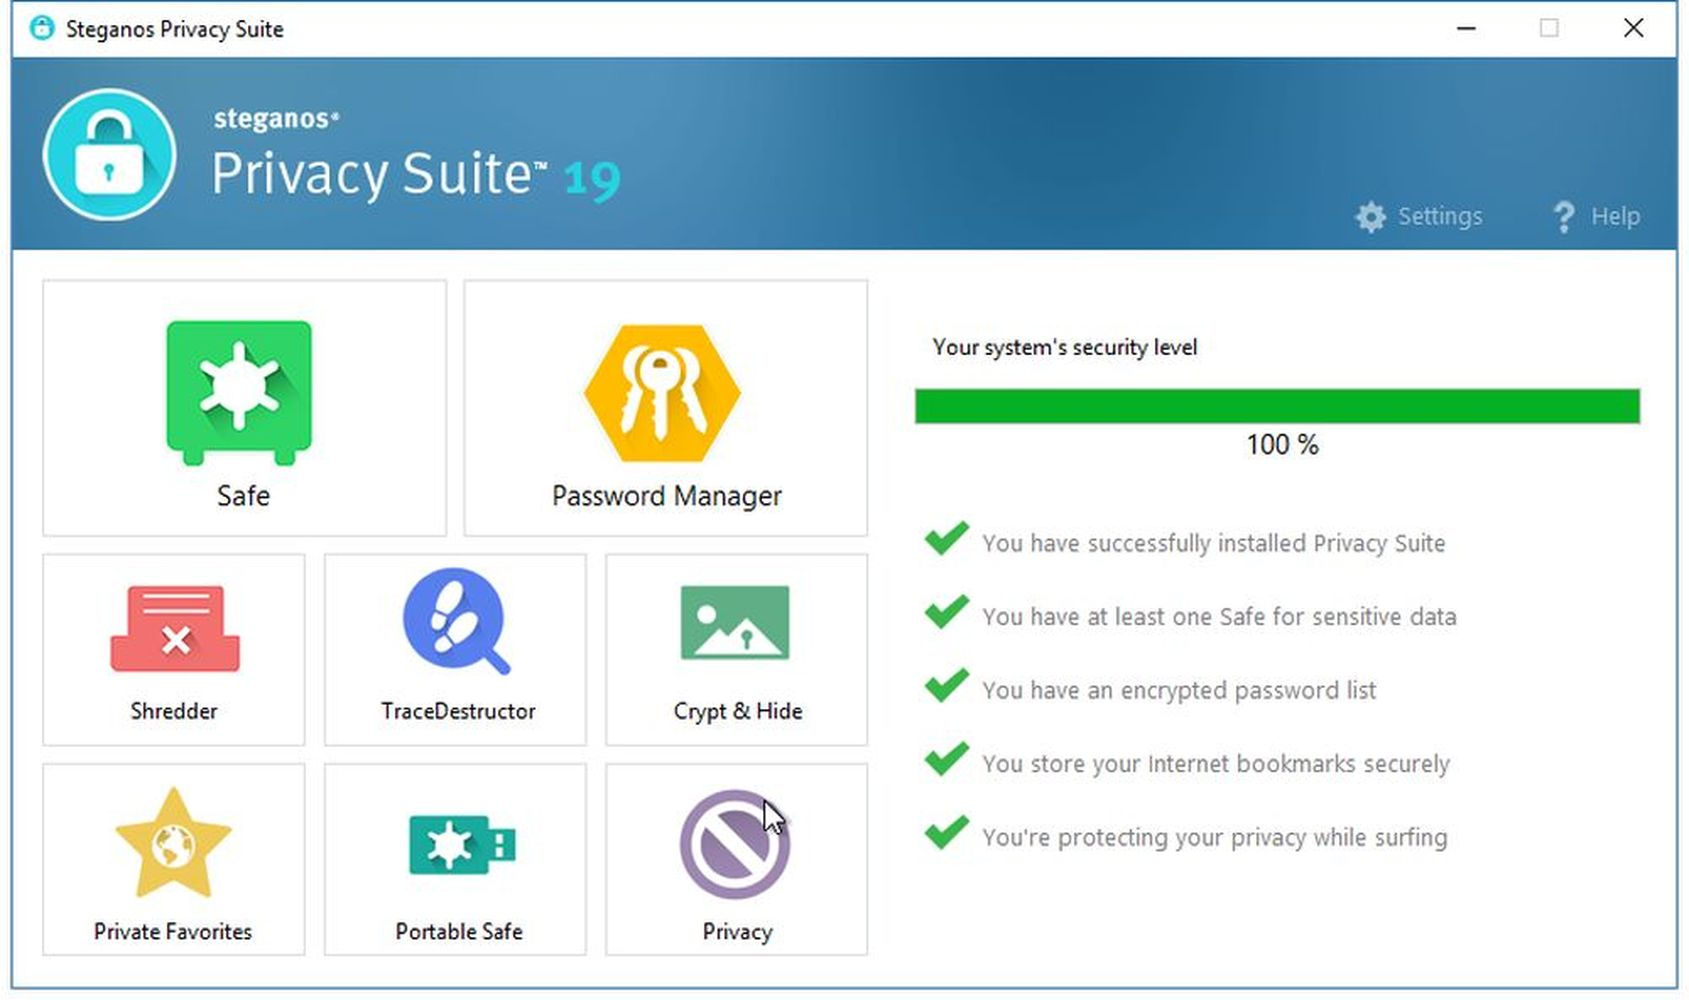 Steganos Privacy Suite 19 - Digital Safe and Password management for Windows 10|8|7 [Download]